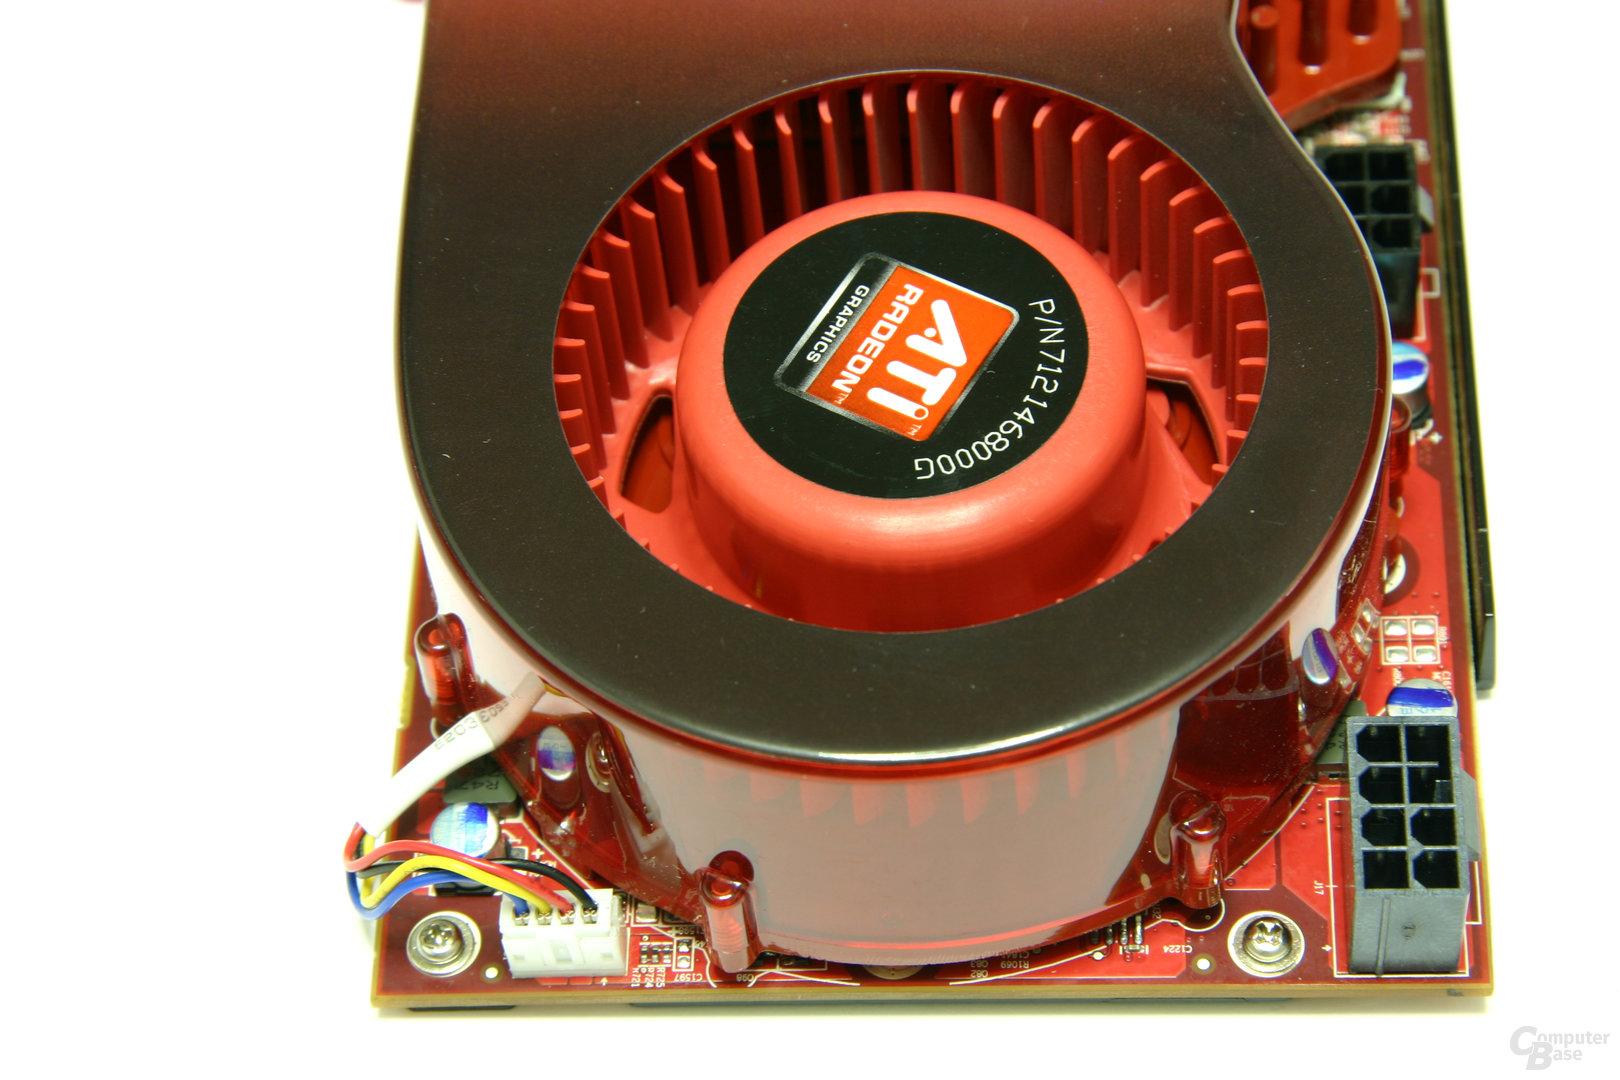 Radeon HD 3870 X2 Spannungswandler